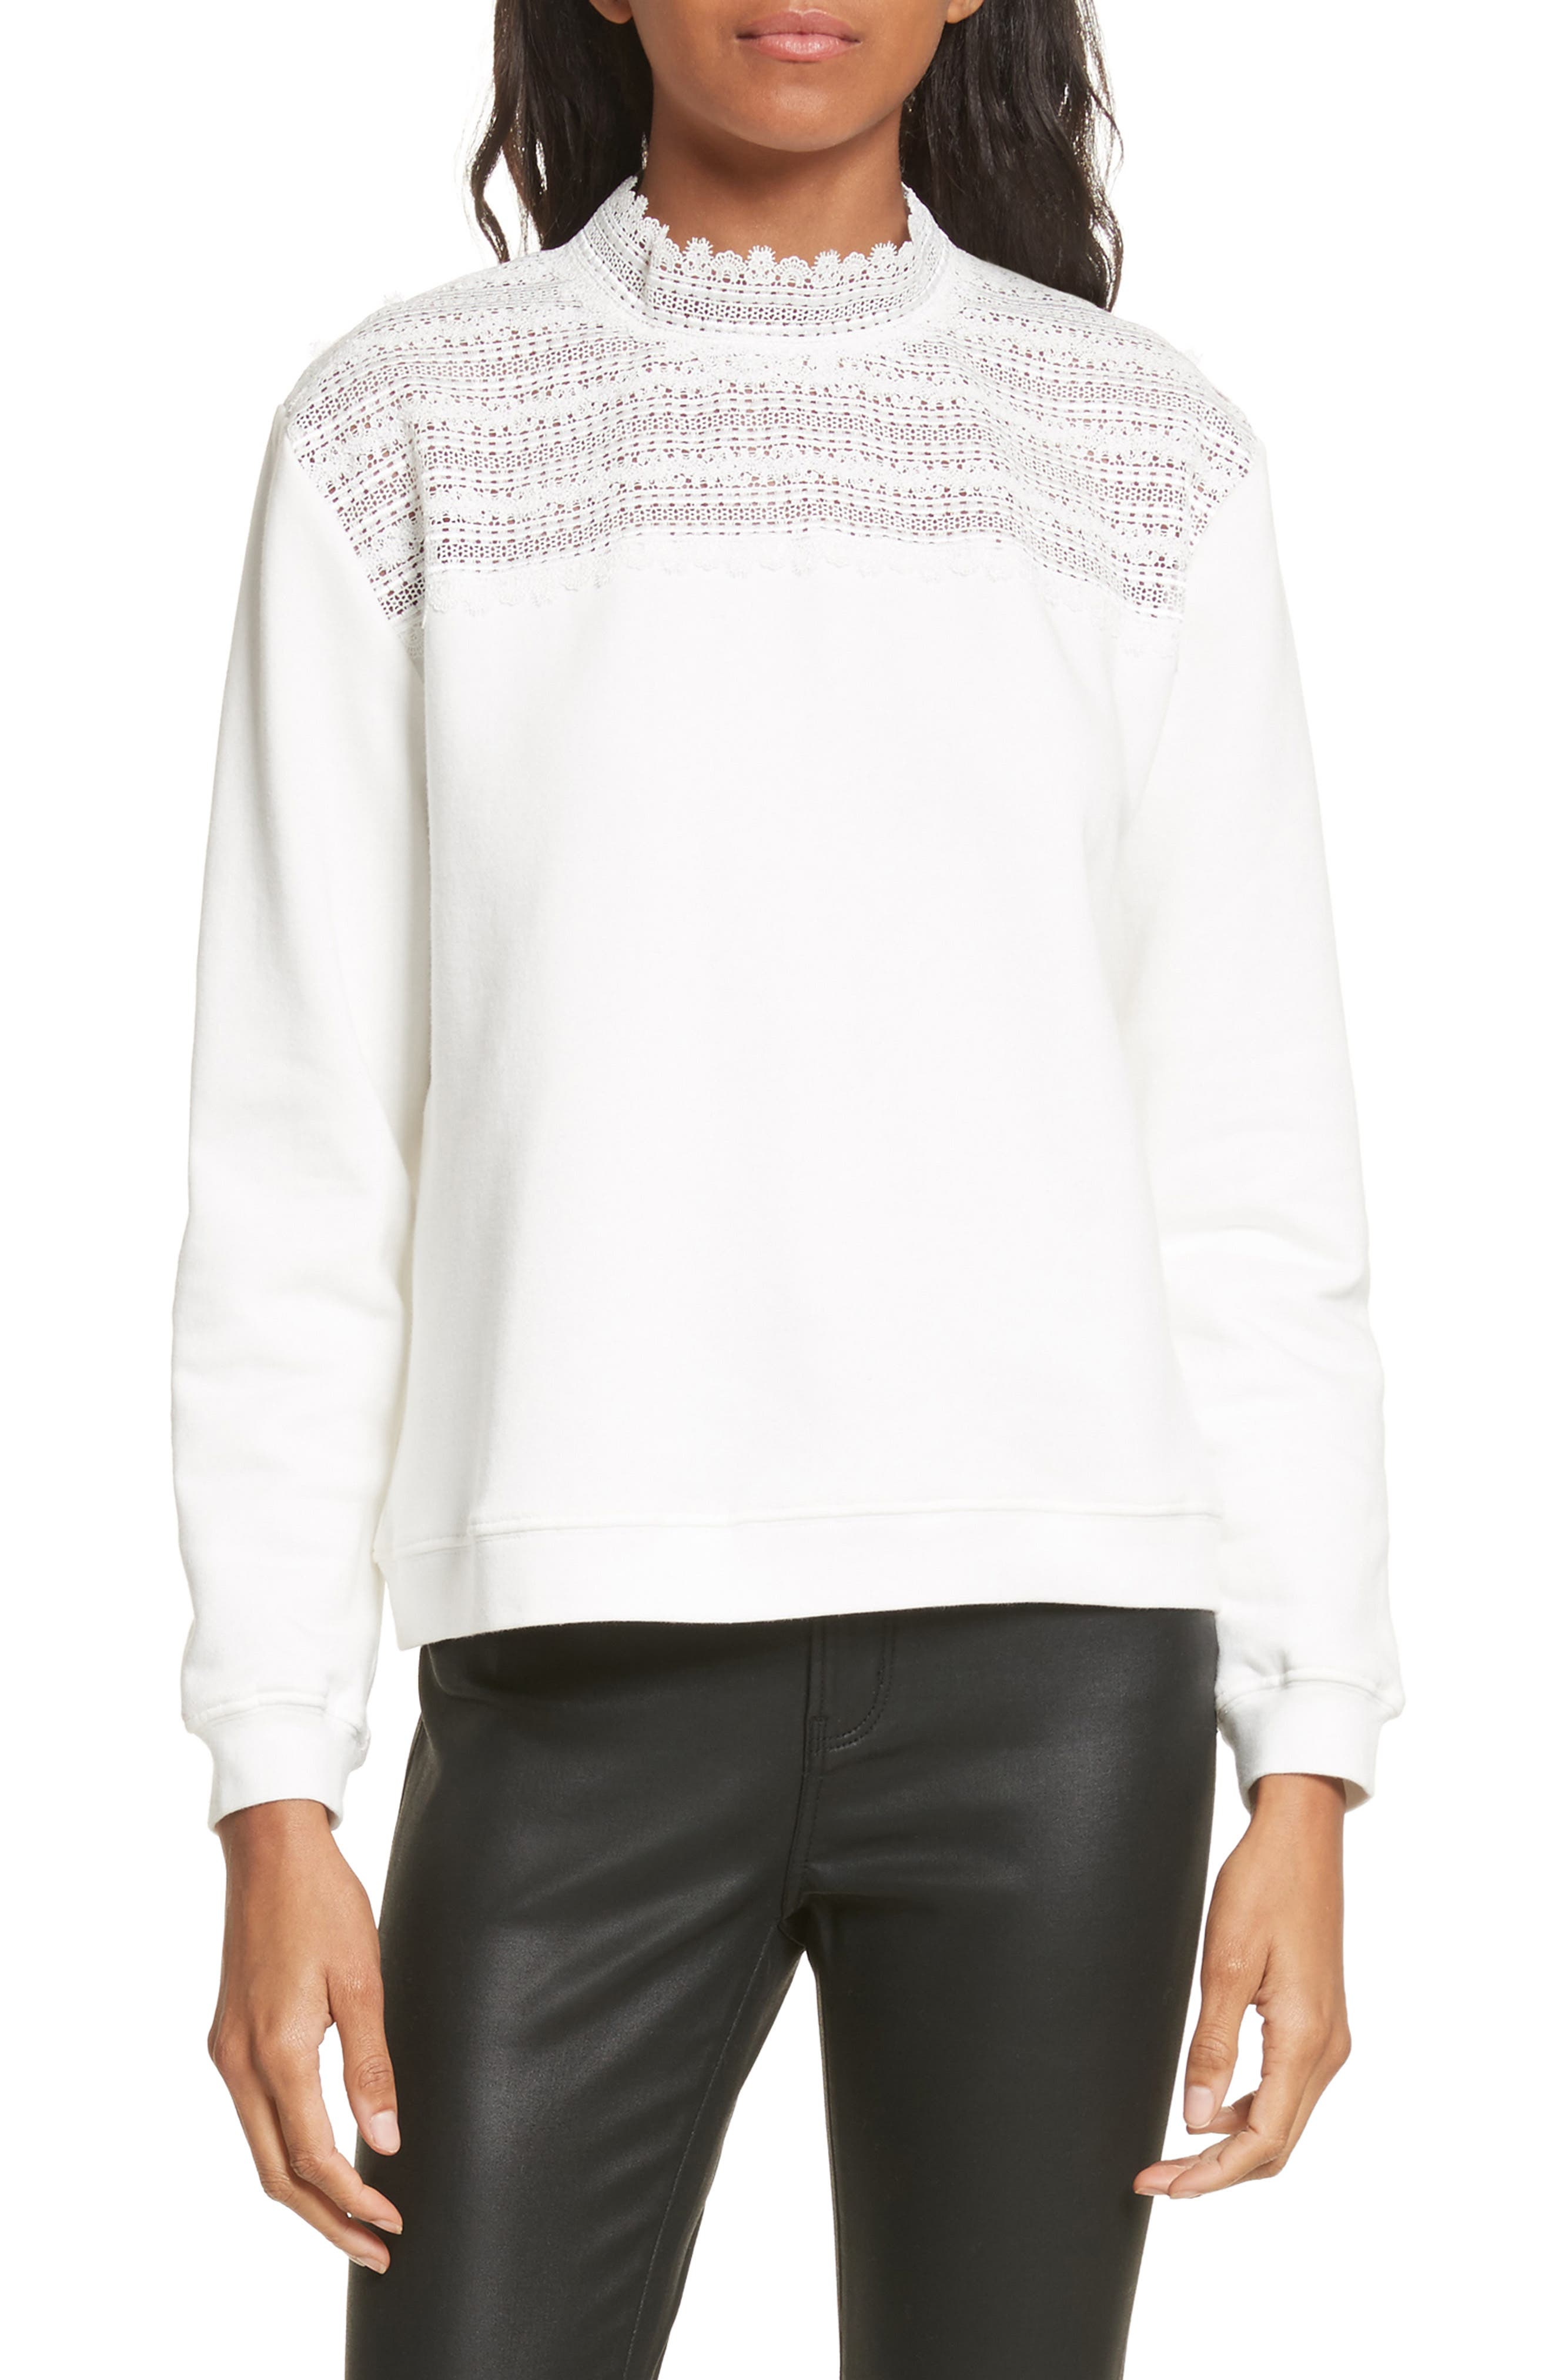 Alternate Image 1 Selected - The Kooples Lace Yoke Sweater